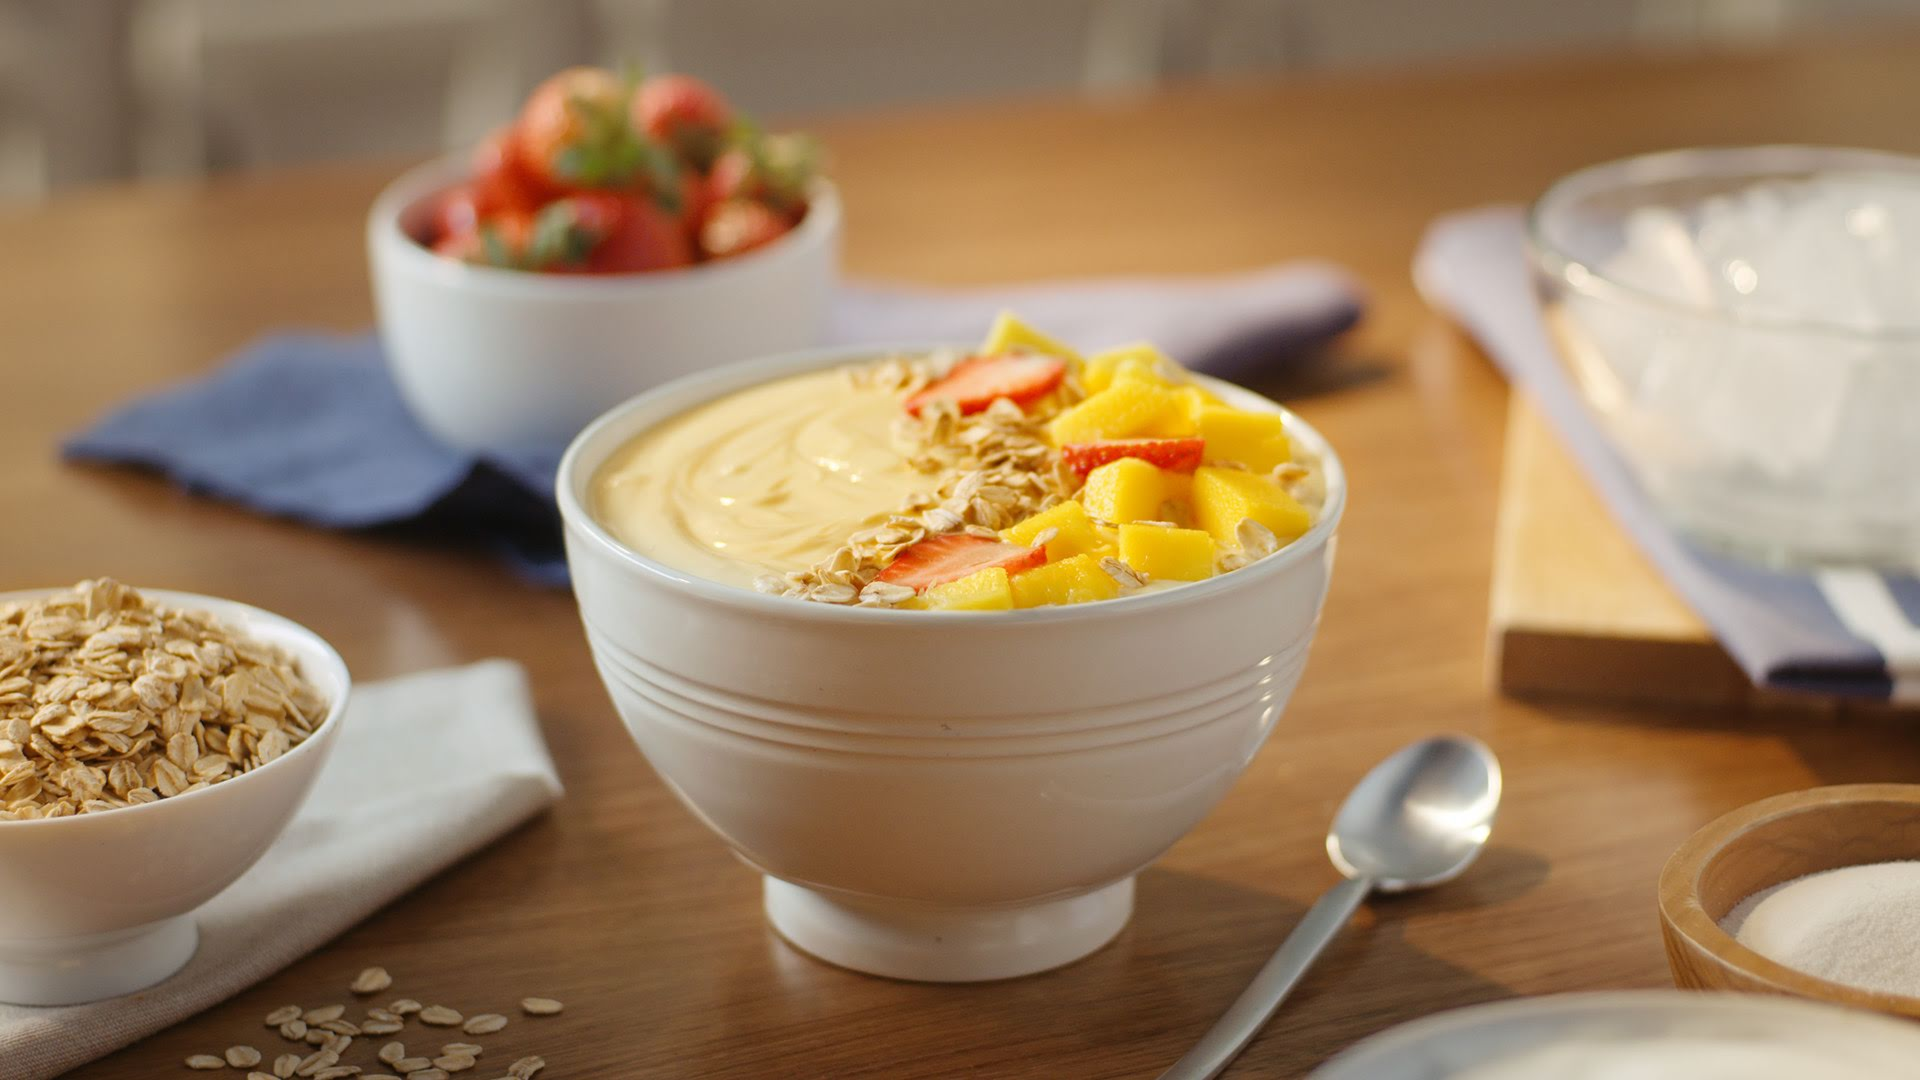 Smoothie bowl de fresa y mango con avena QUAKER®